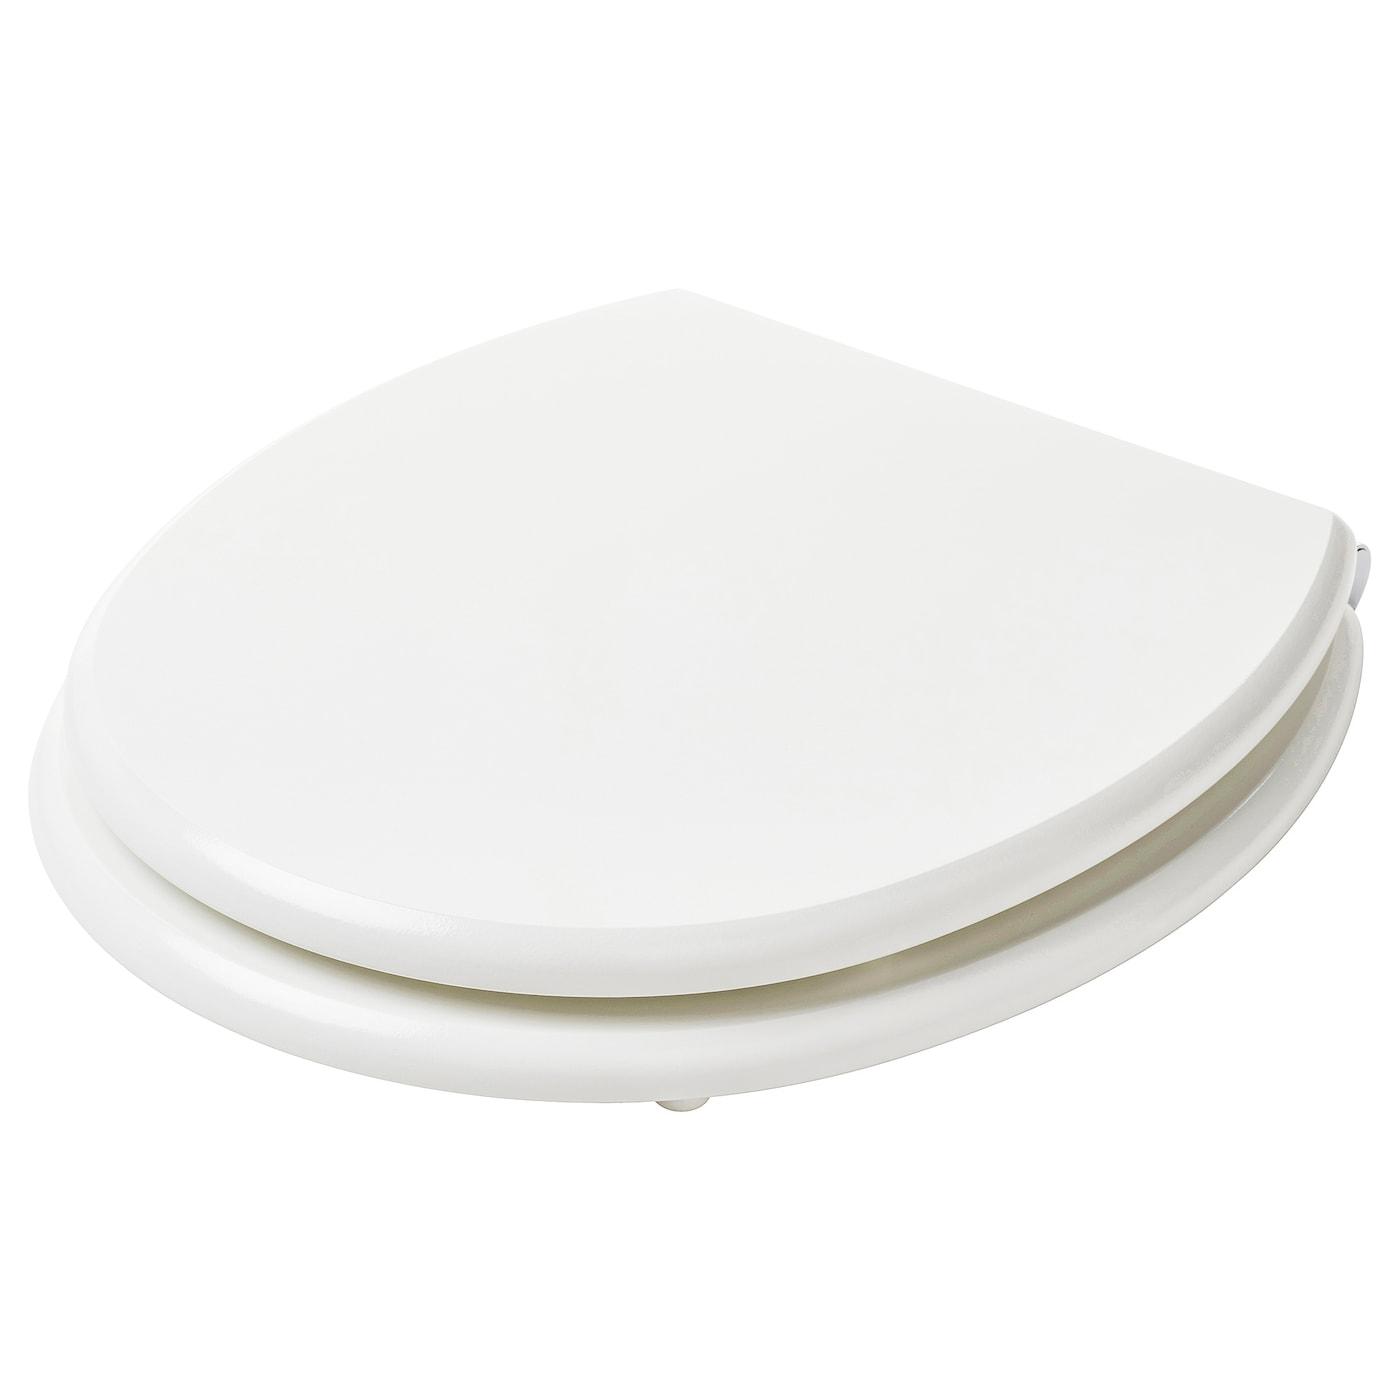 Meuble Dessus Toilette Ikea kullarna abattant wc - blanc